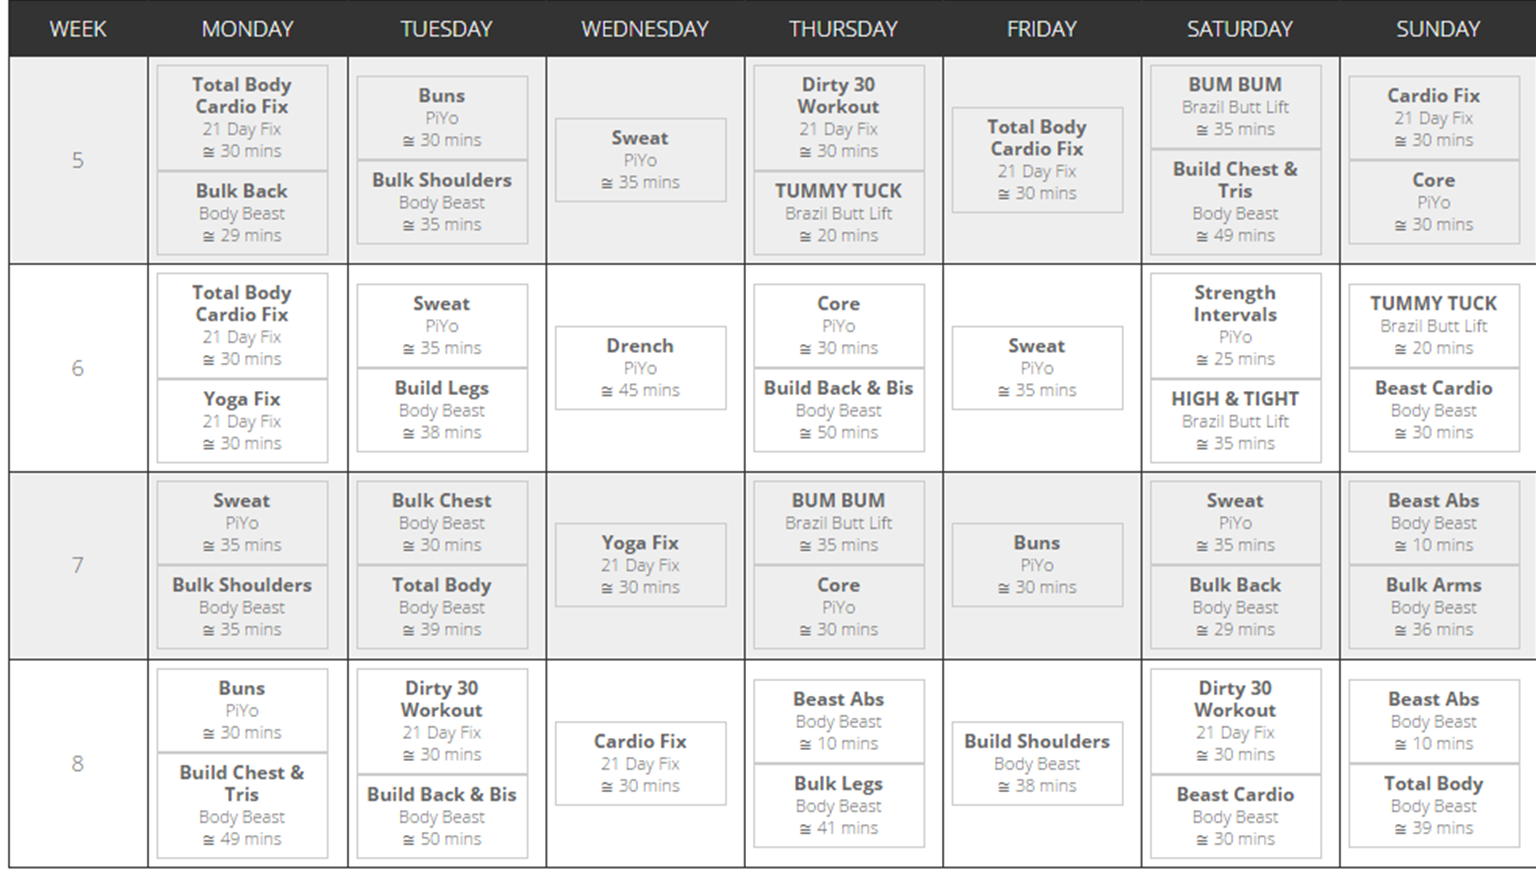 21 Day Fix Beachbody Calendar For More Customized